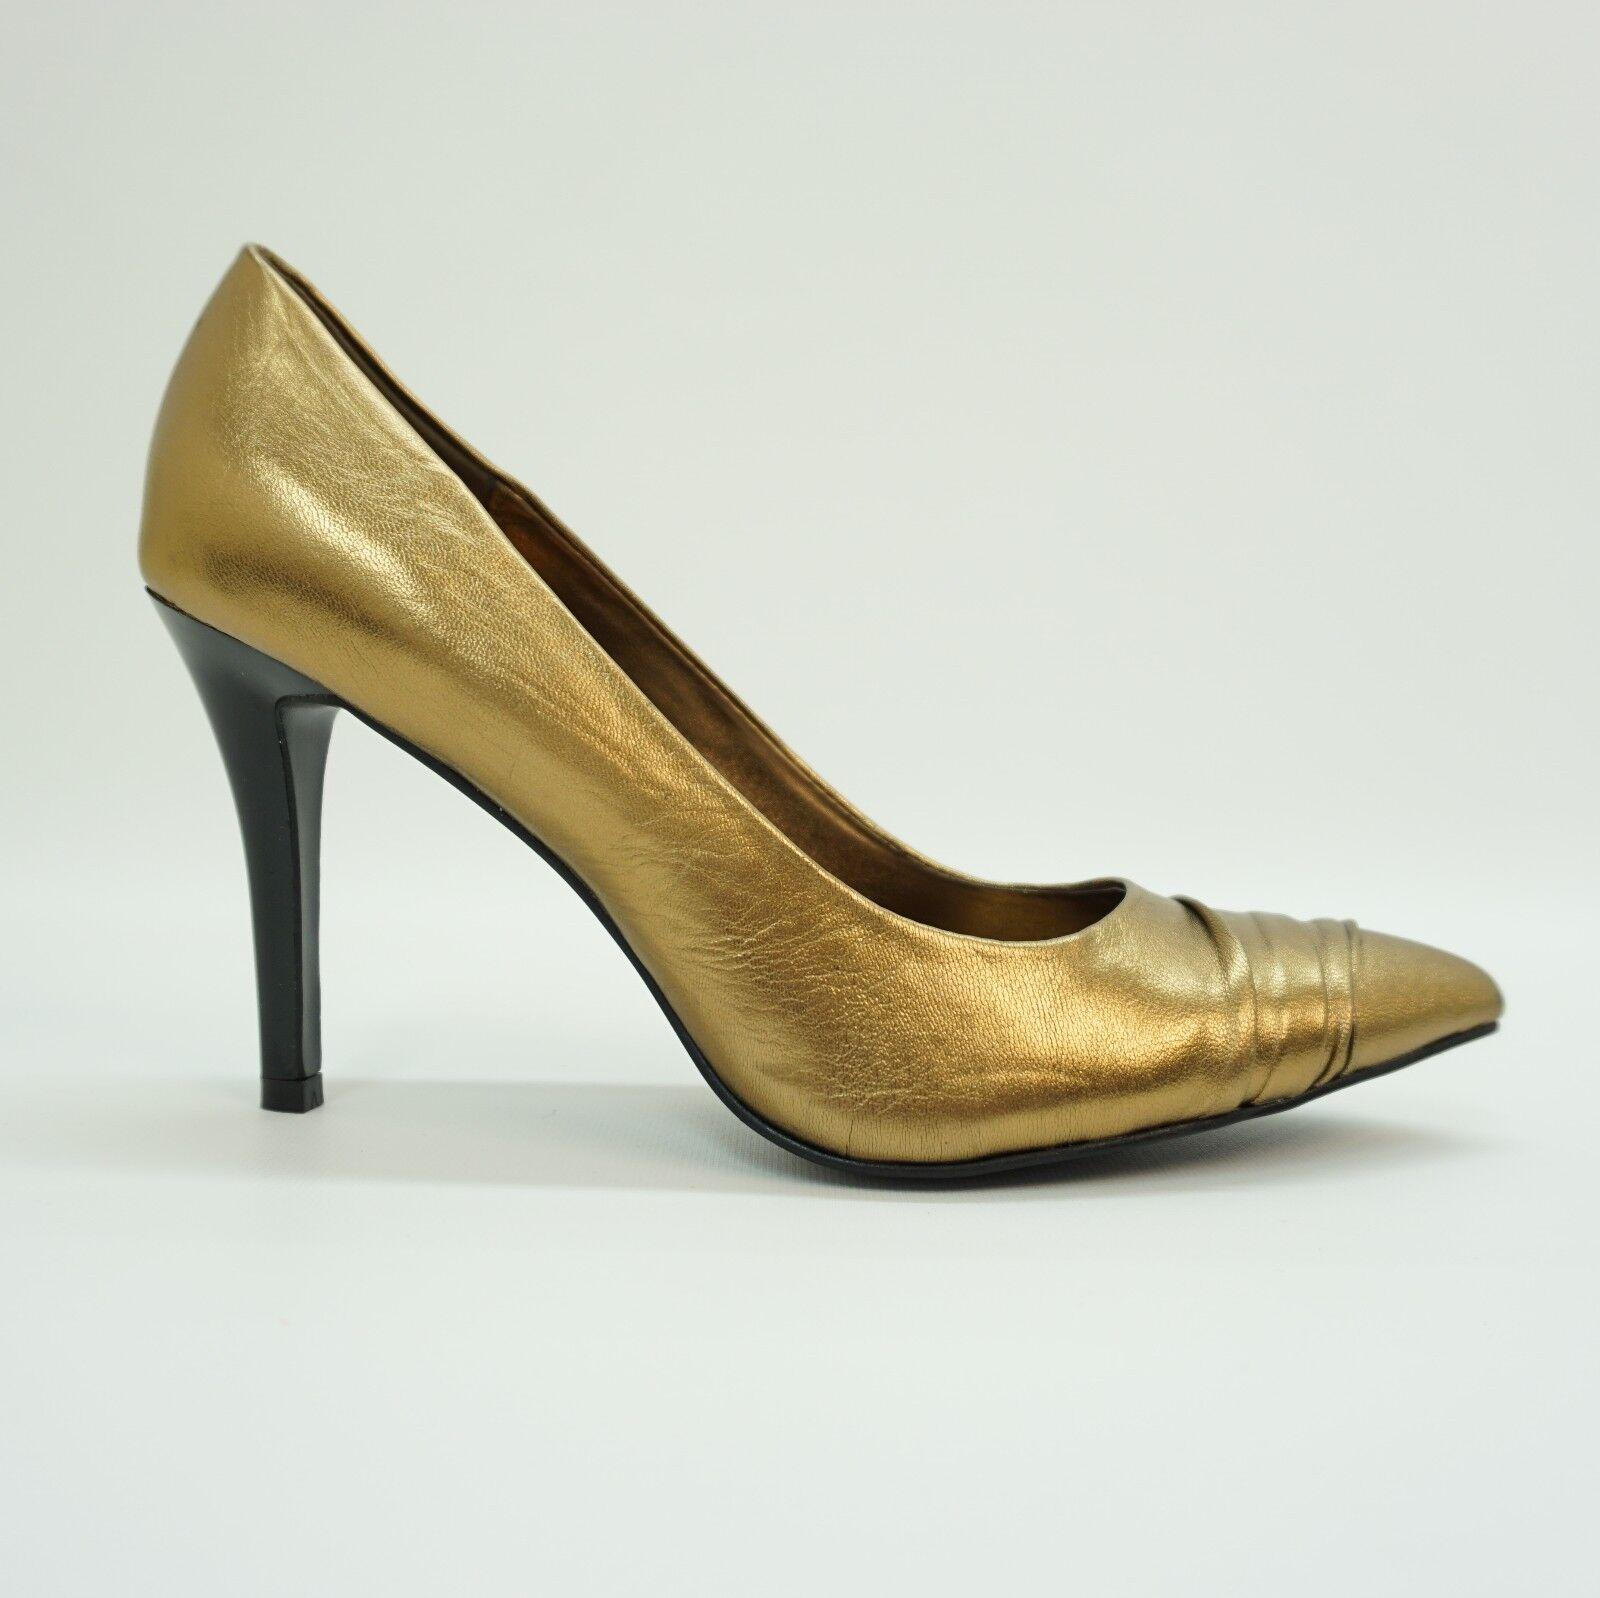 Carlos By Carlos Santana Women shoes Chapter Pump Heel Bronze Metallic Leather 8M